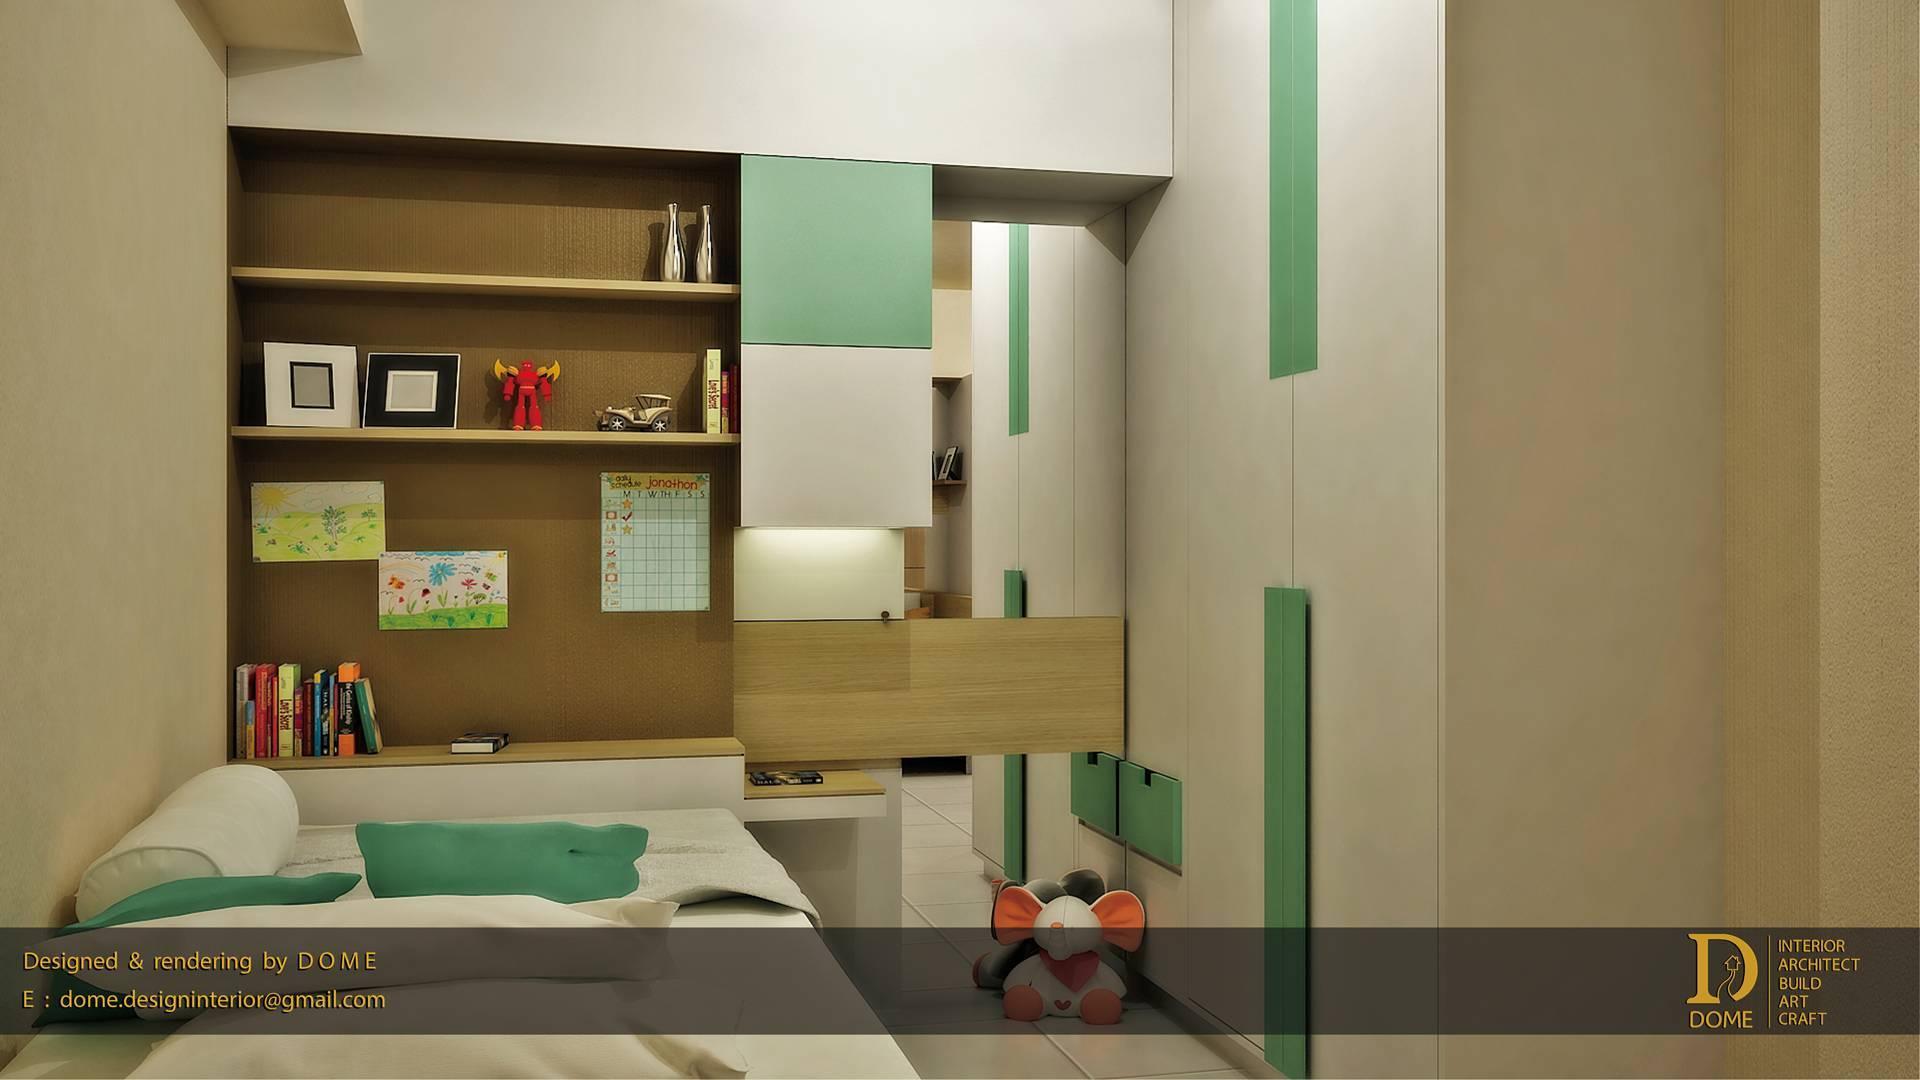 Dome Interiorarch Educity Apartment At Pakuwon City Surabaya, East Java, Indonesia Surabaya, East Java, Indonesia Boys-Bedroom   3515